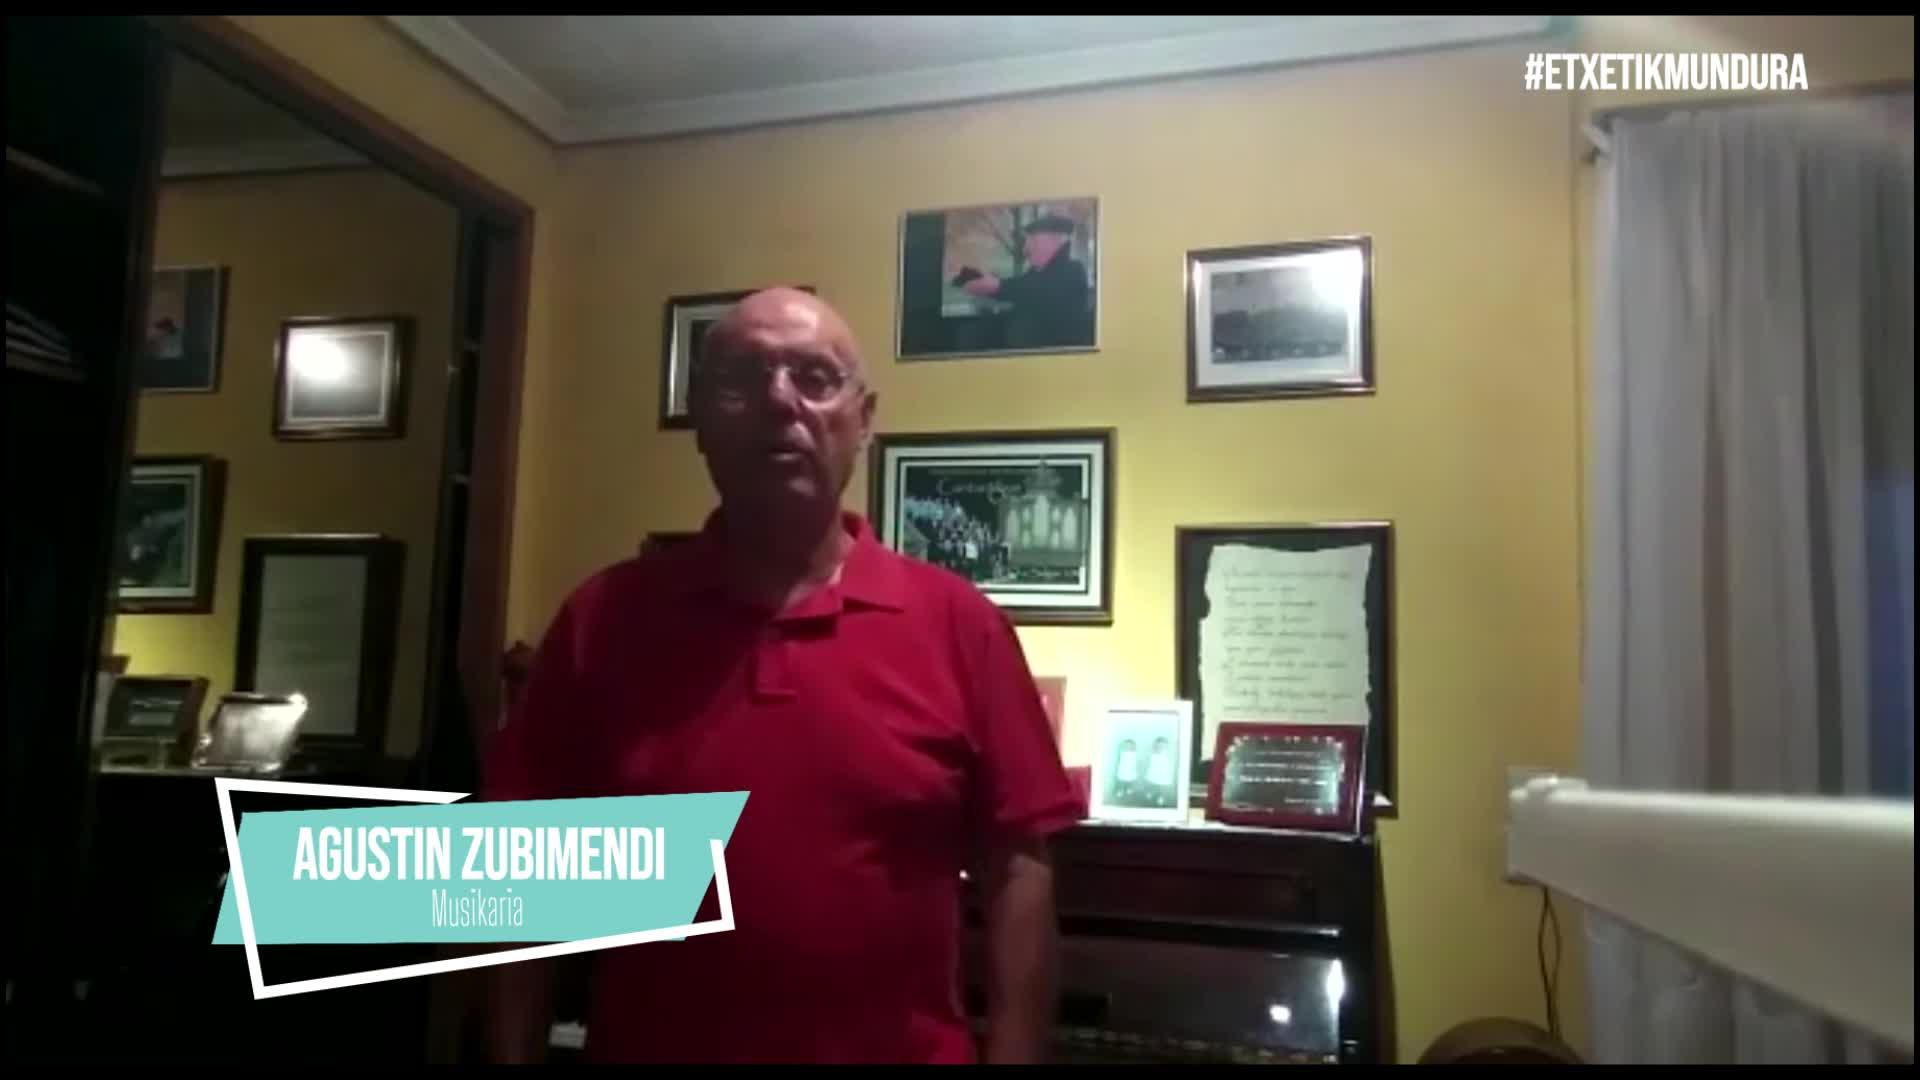 Agustin Zubimendi musikaria, etxetik mundura